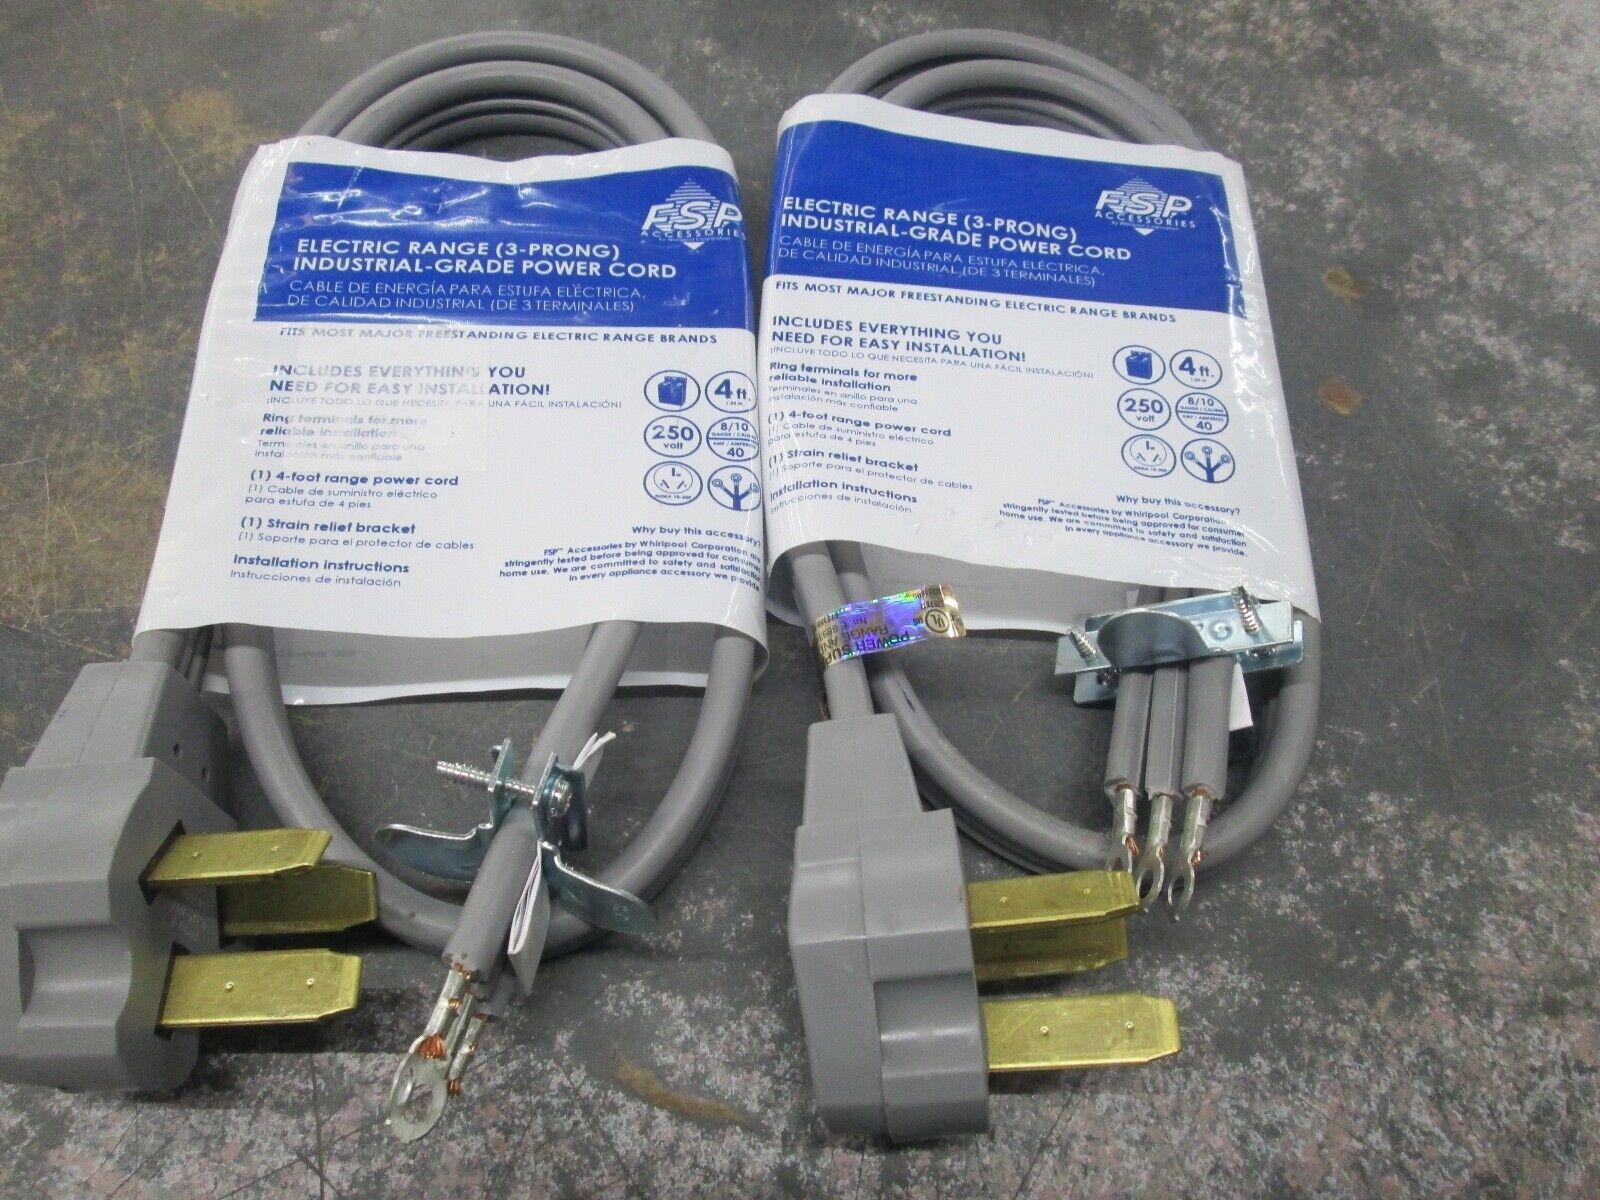 2PCS FSP ELECTRIC RANGE  INDUSTRIAL-GRADE POWER CORD NEW